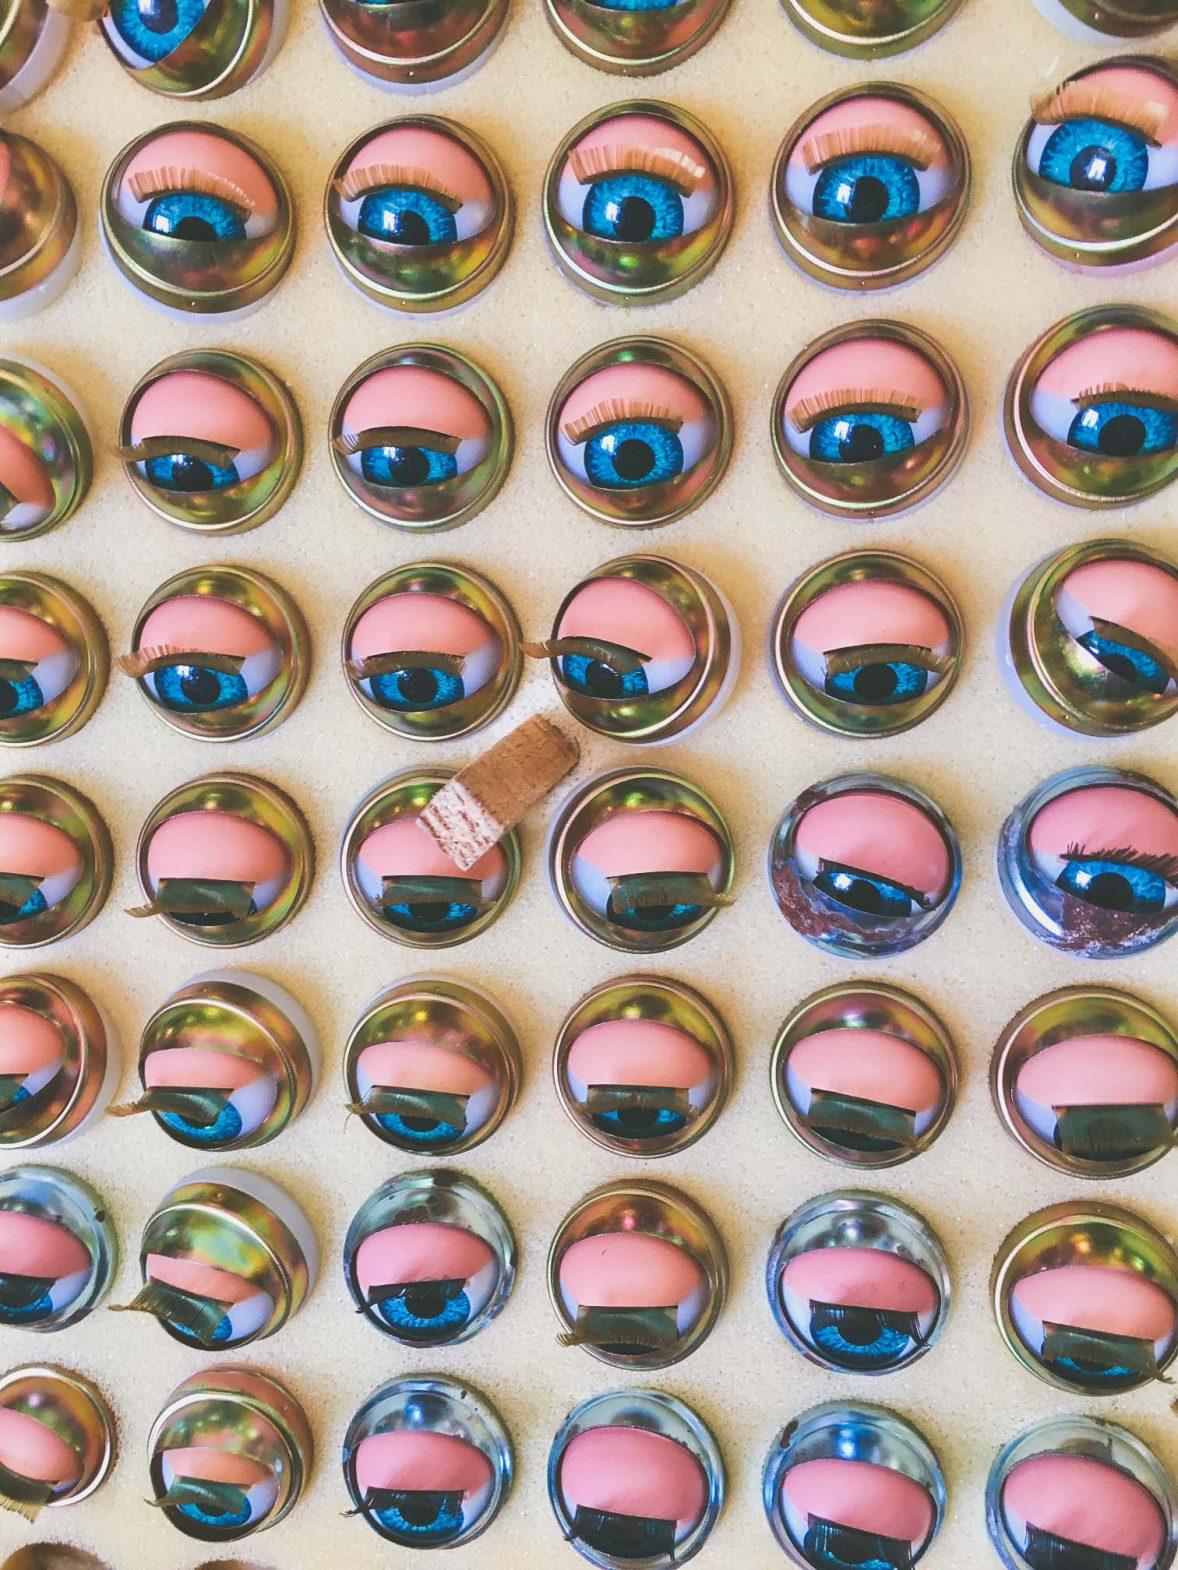 Doll eyes ready to be transplanted at Hospital de Bonecas (doll hospital), in Lisbon, Portugal.